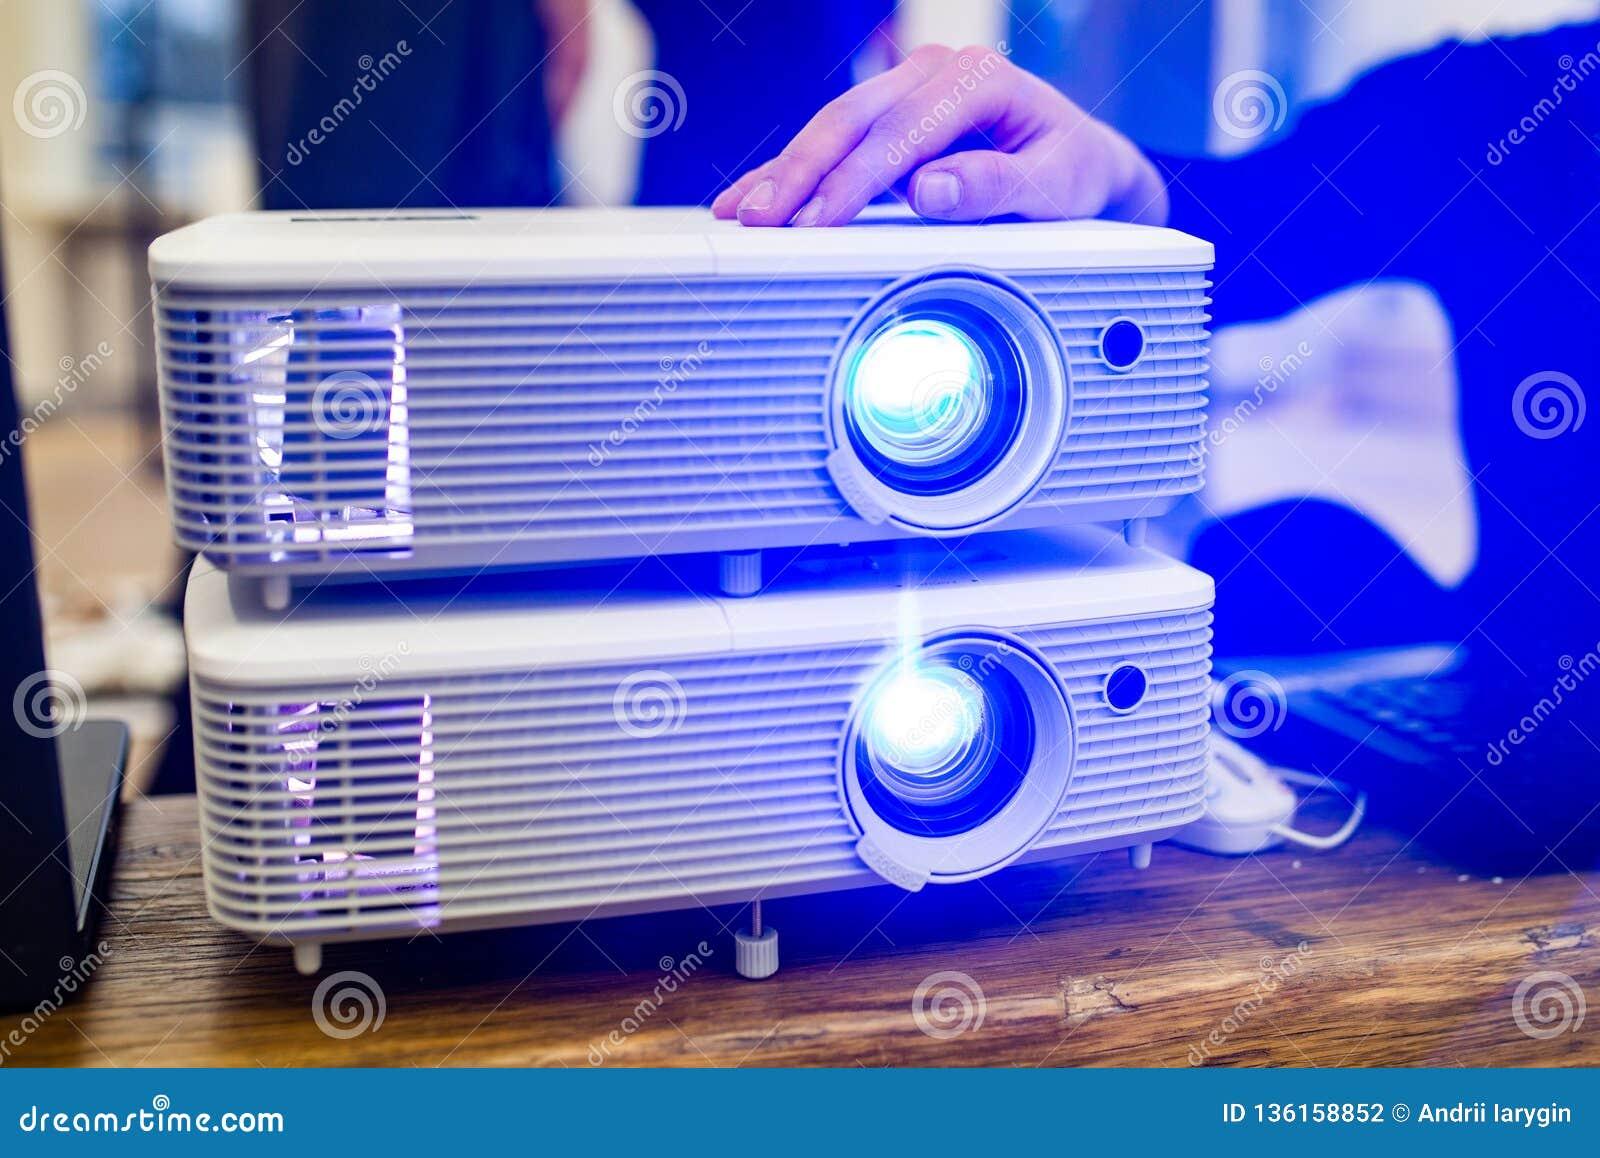 Presentation projector